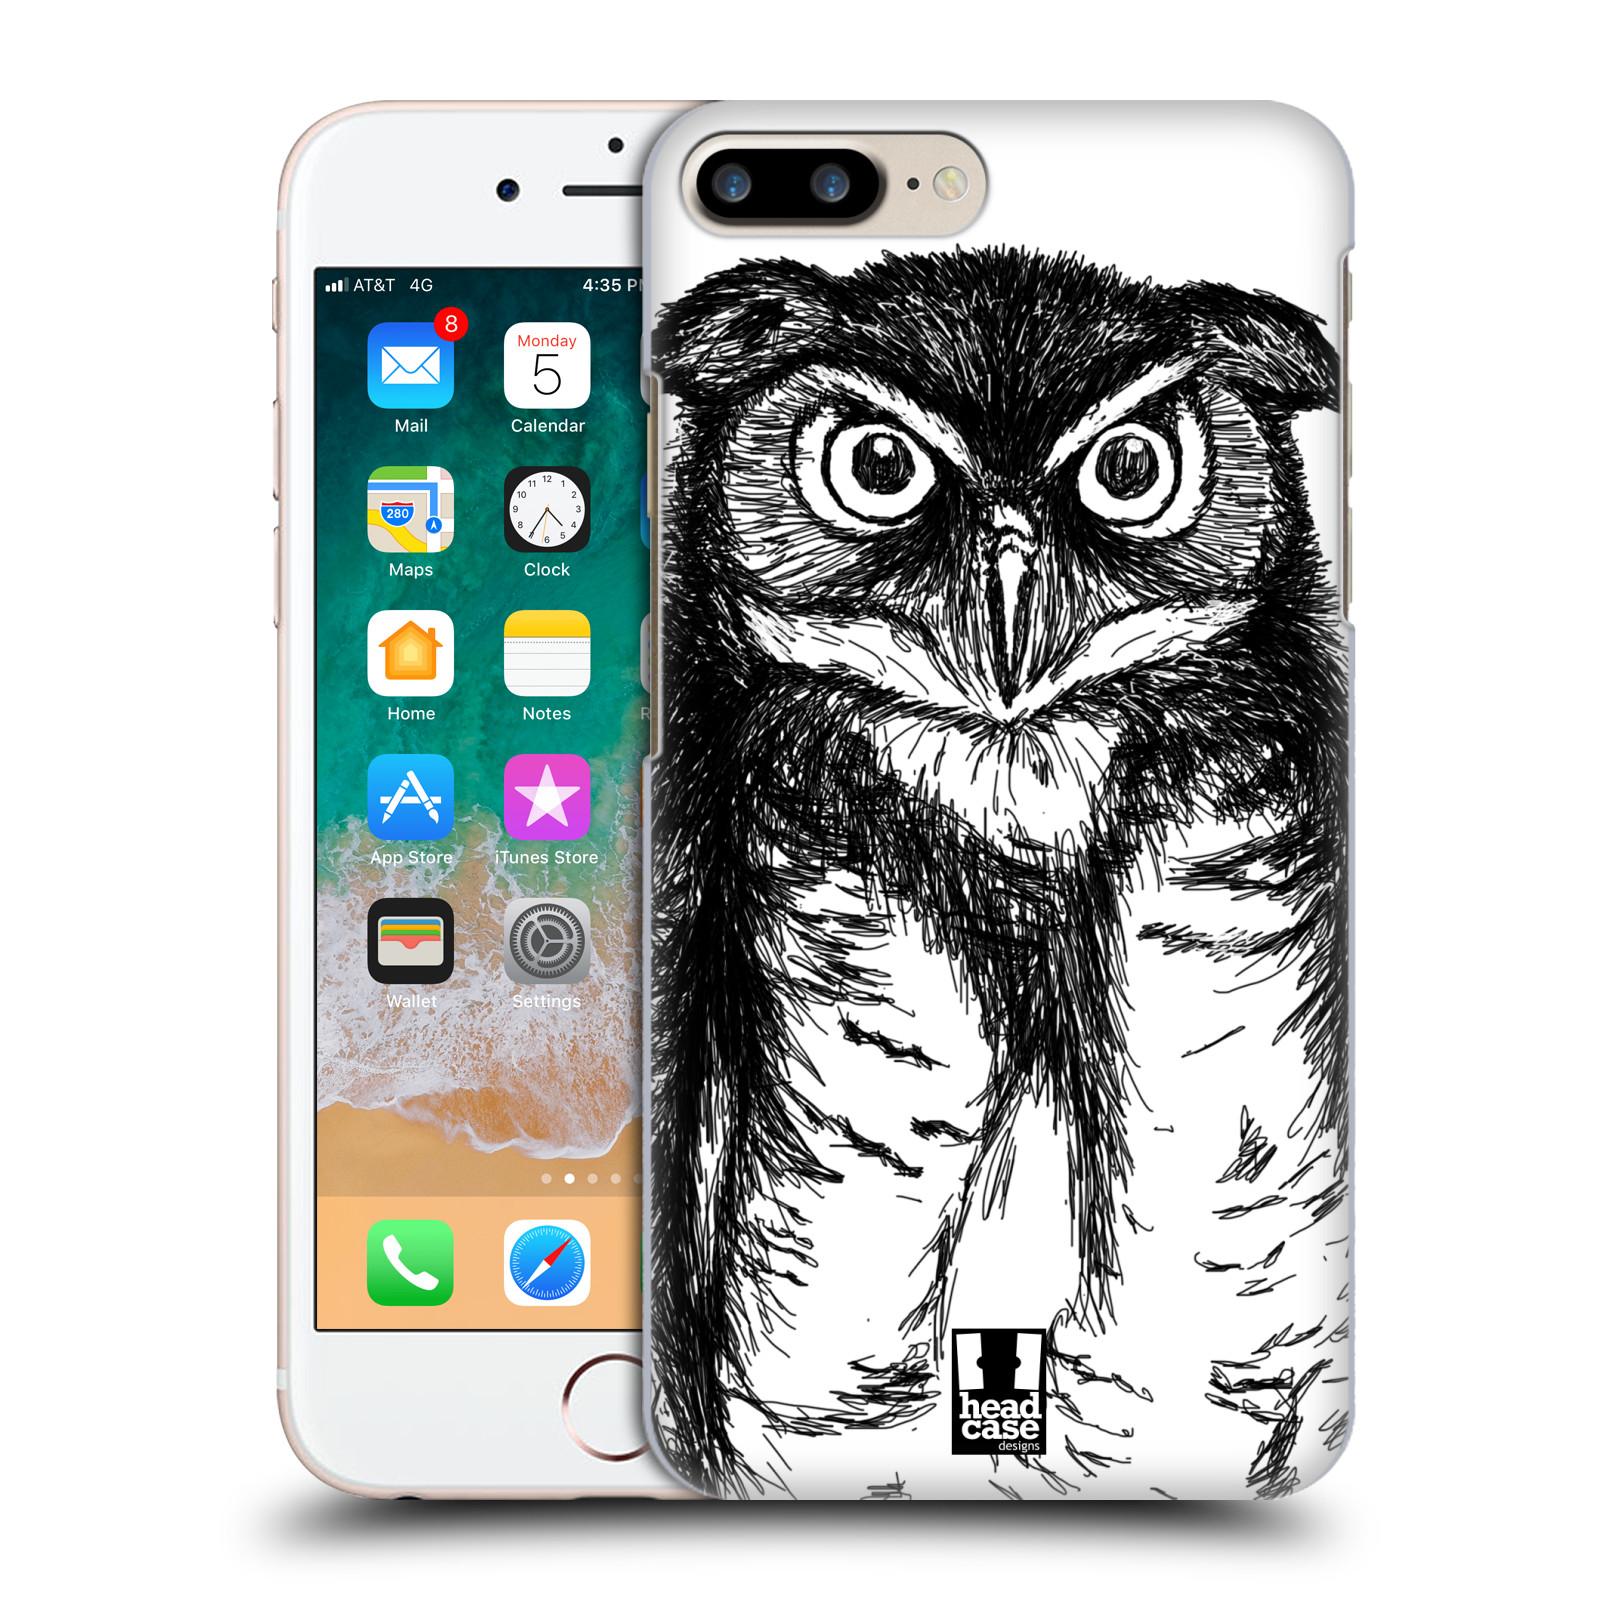 HEAD CASE plastový obal na mobil Apple Iphone 7 PLUS vzor Kreslená zvířátka černá a bílá sova